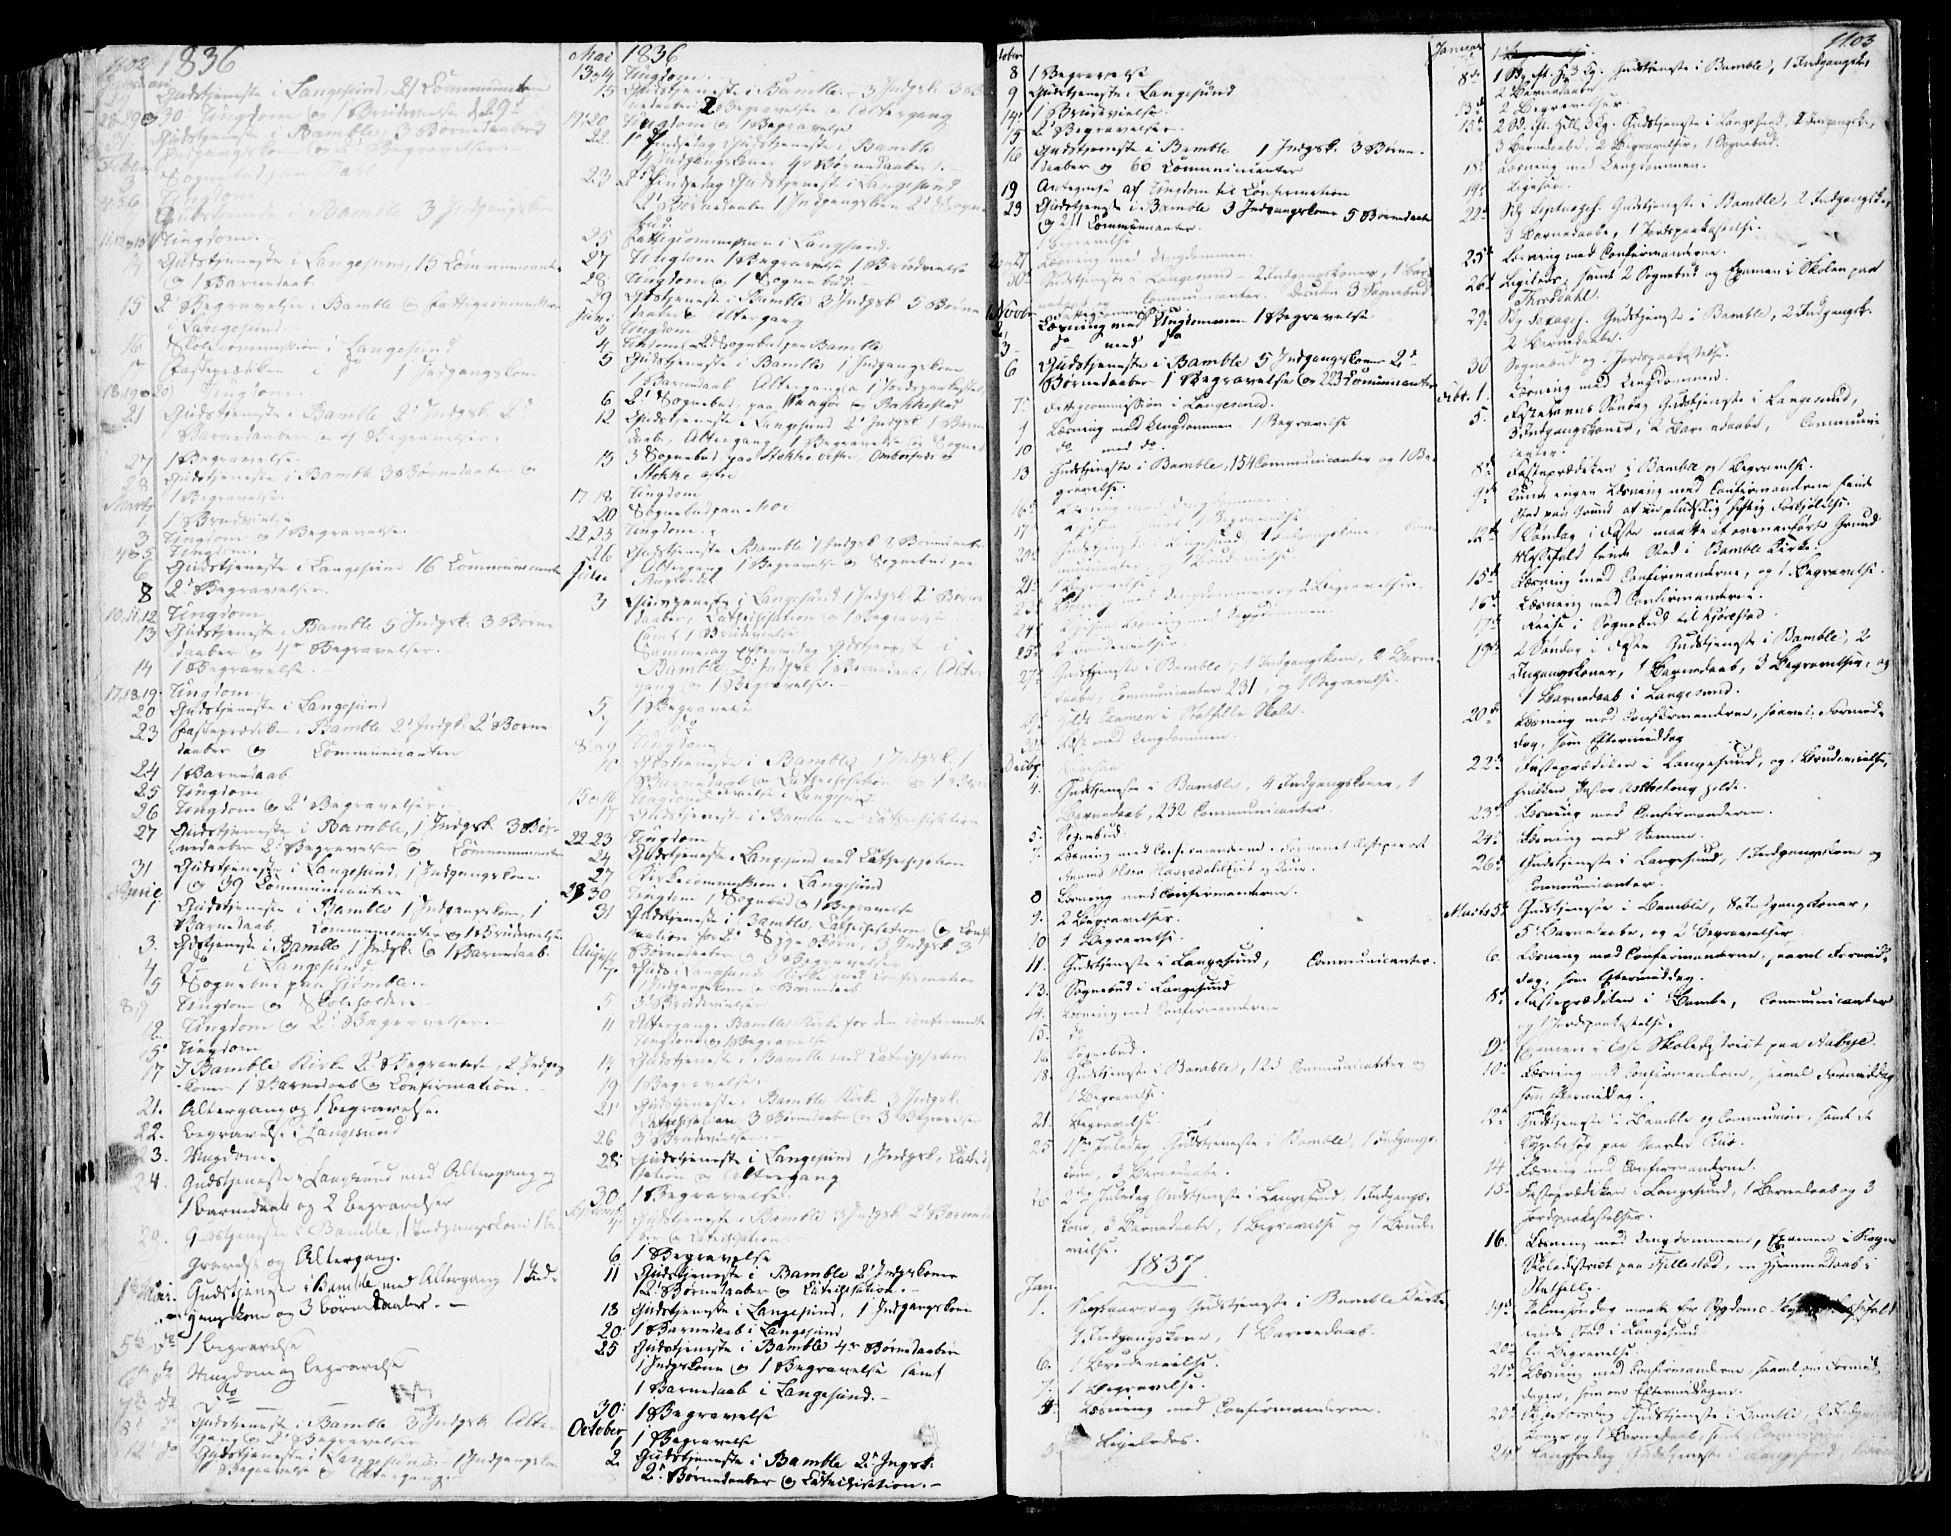 SAKO, Bamble kirkebøker, F/Fa/L0004: Ministerialbok nr. I 4, 1834-1853, s. 1102-1103